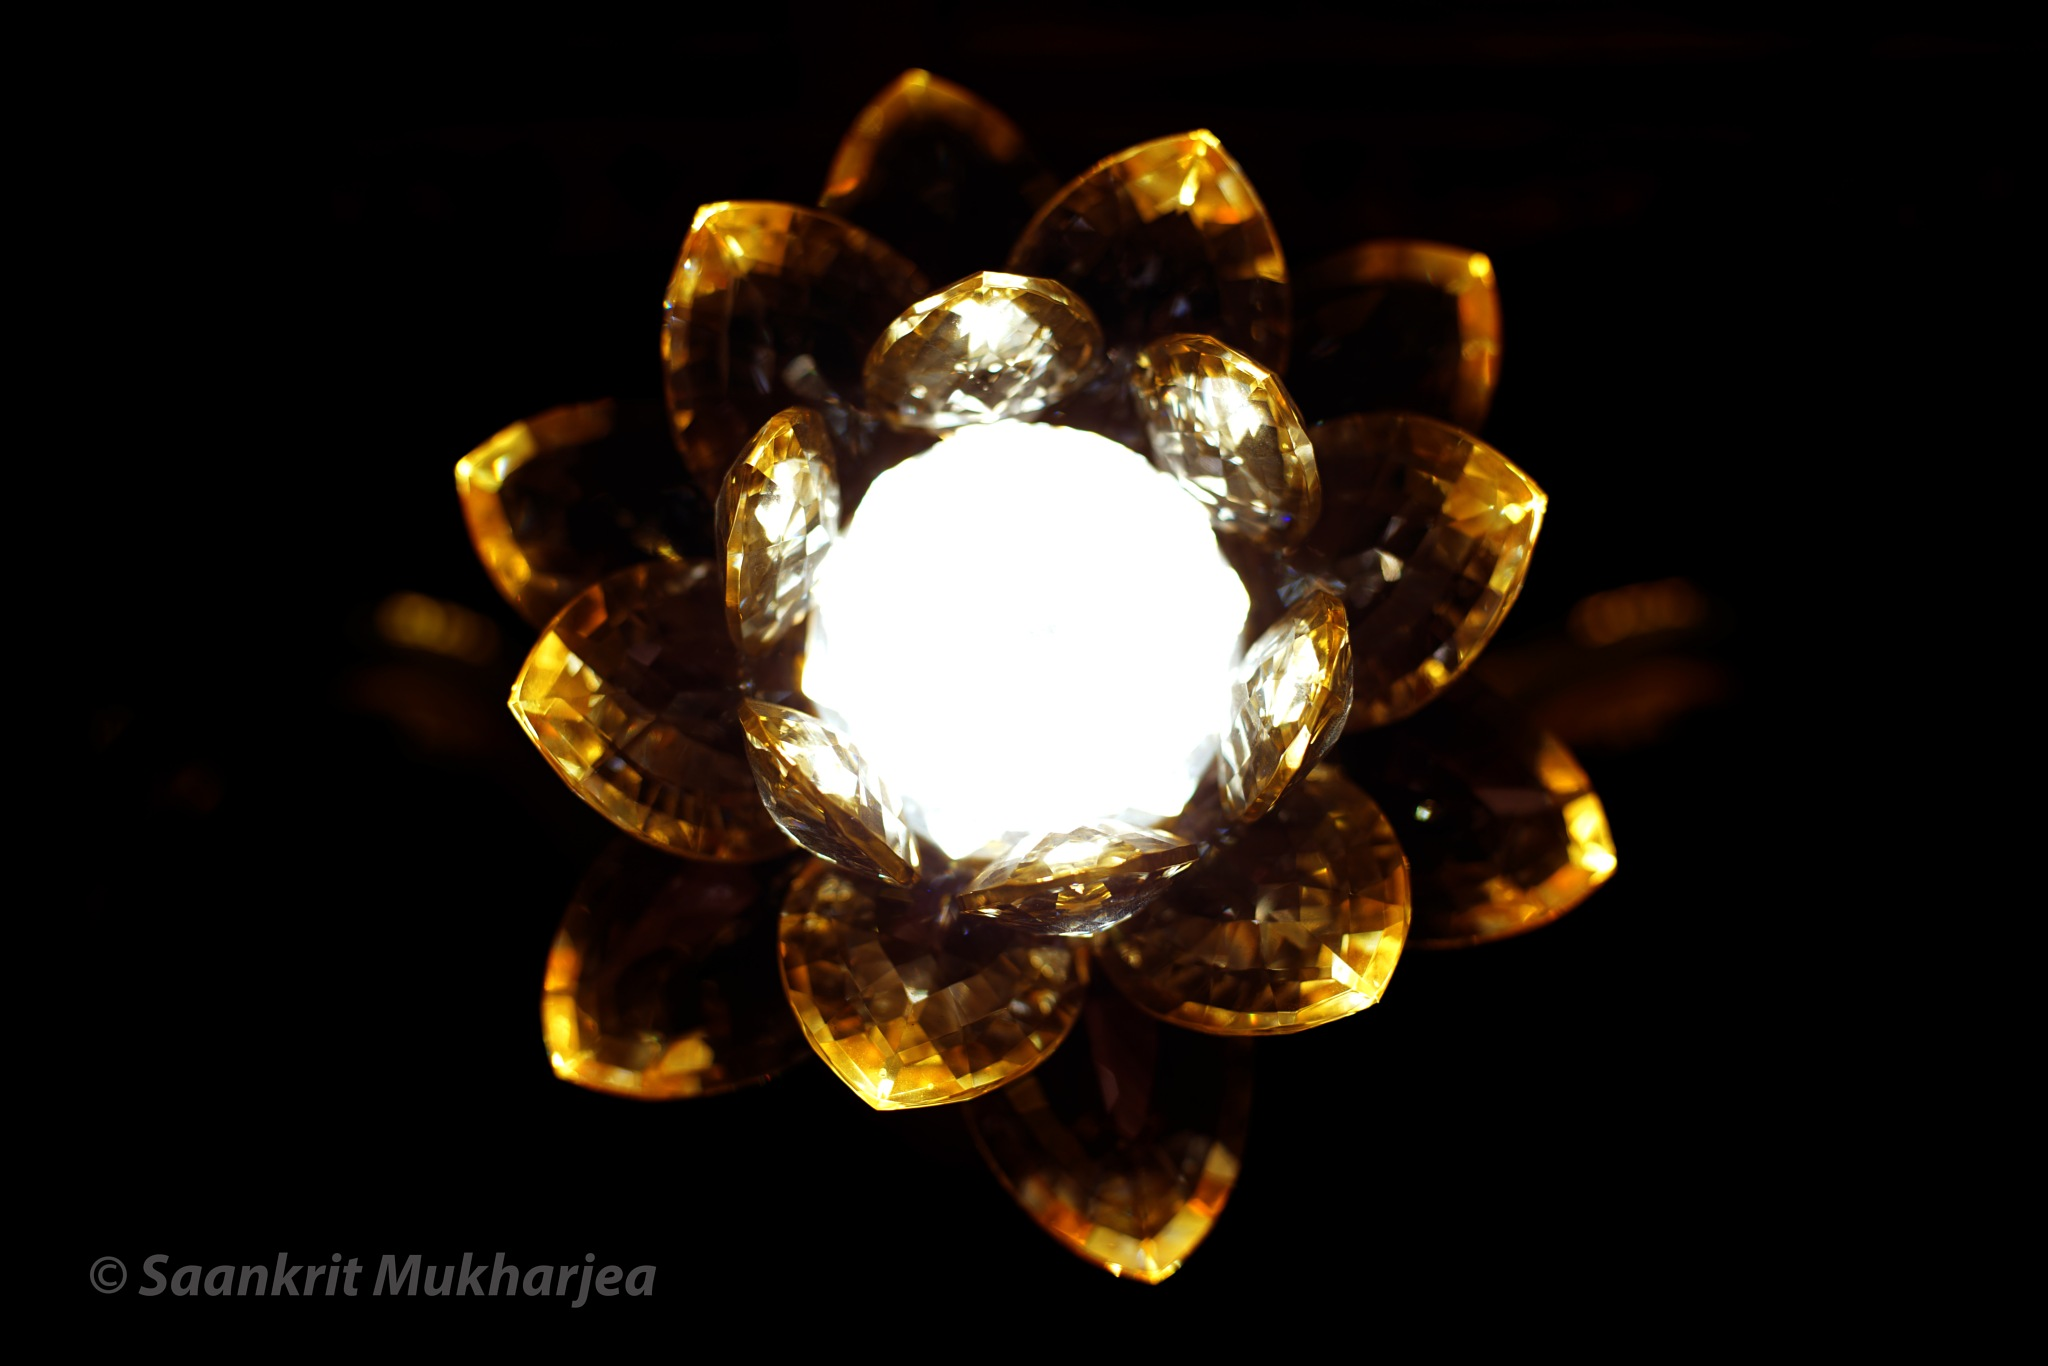 Untitled by Saankrit Mukharjea